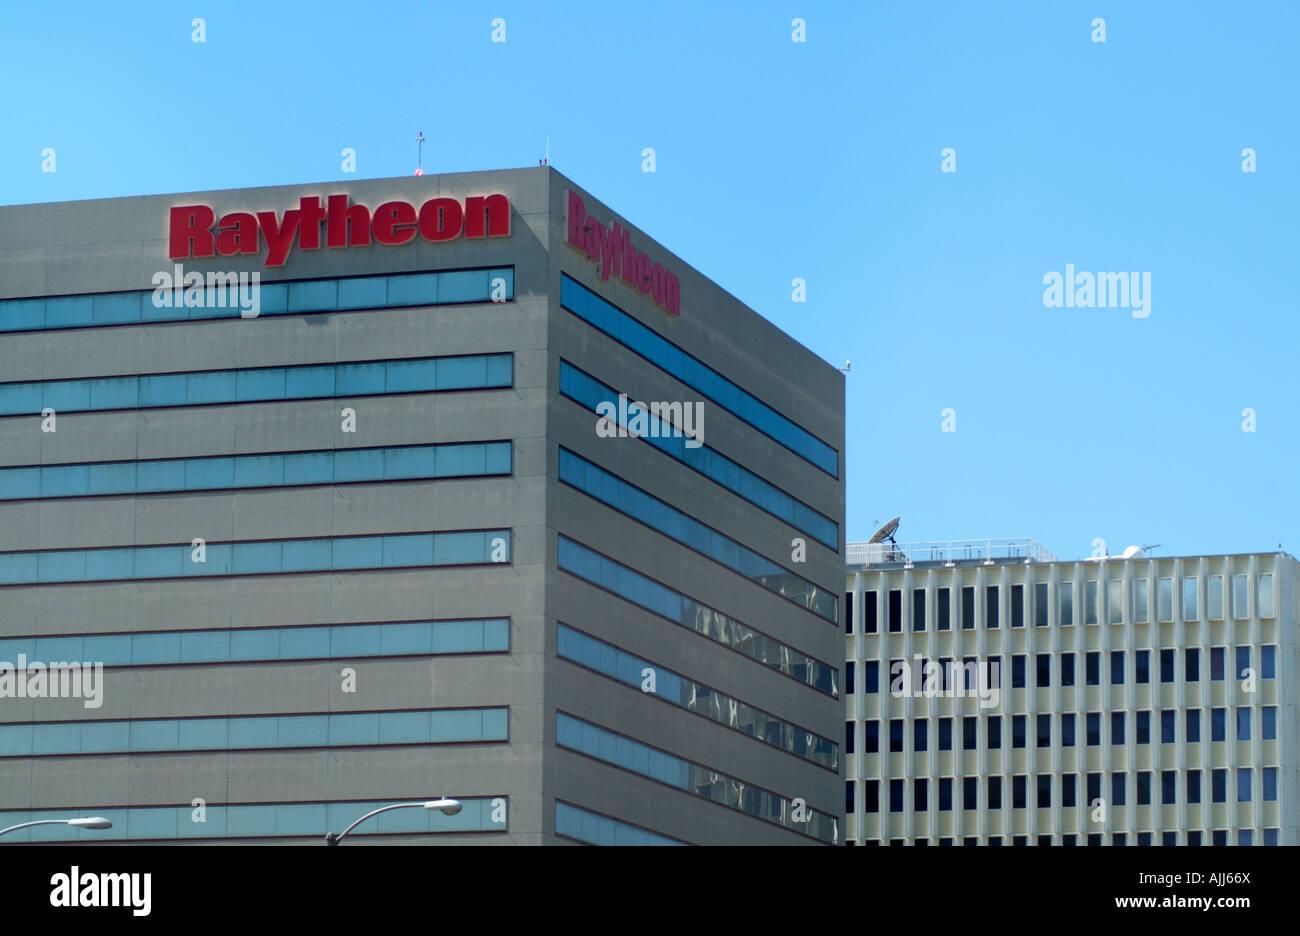 Raytheon Company Building Los Angeles USA - Stock Image